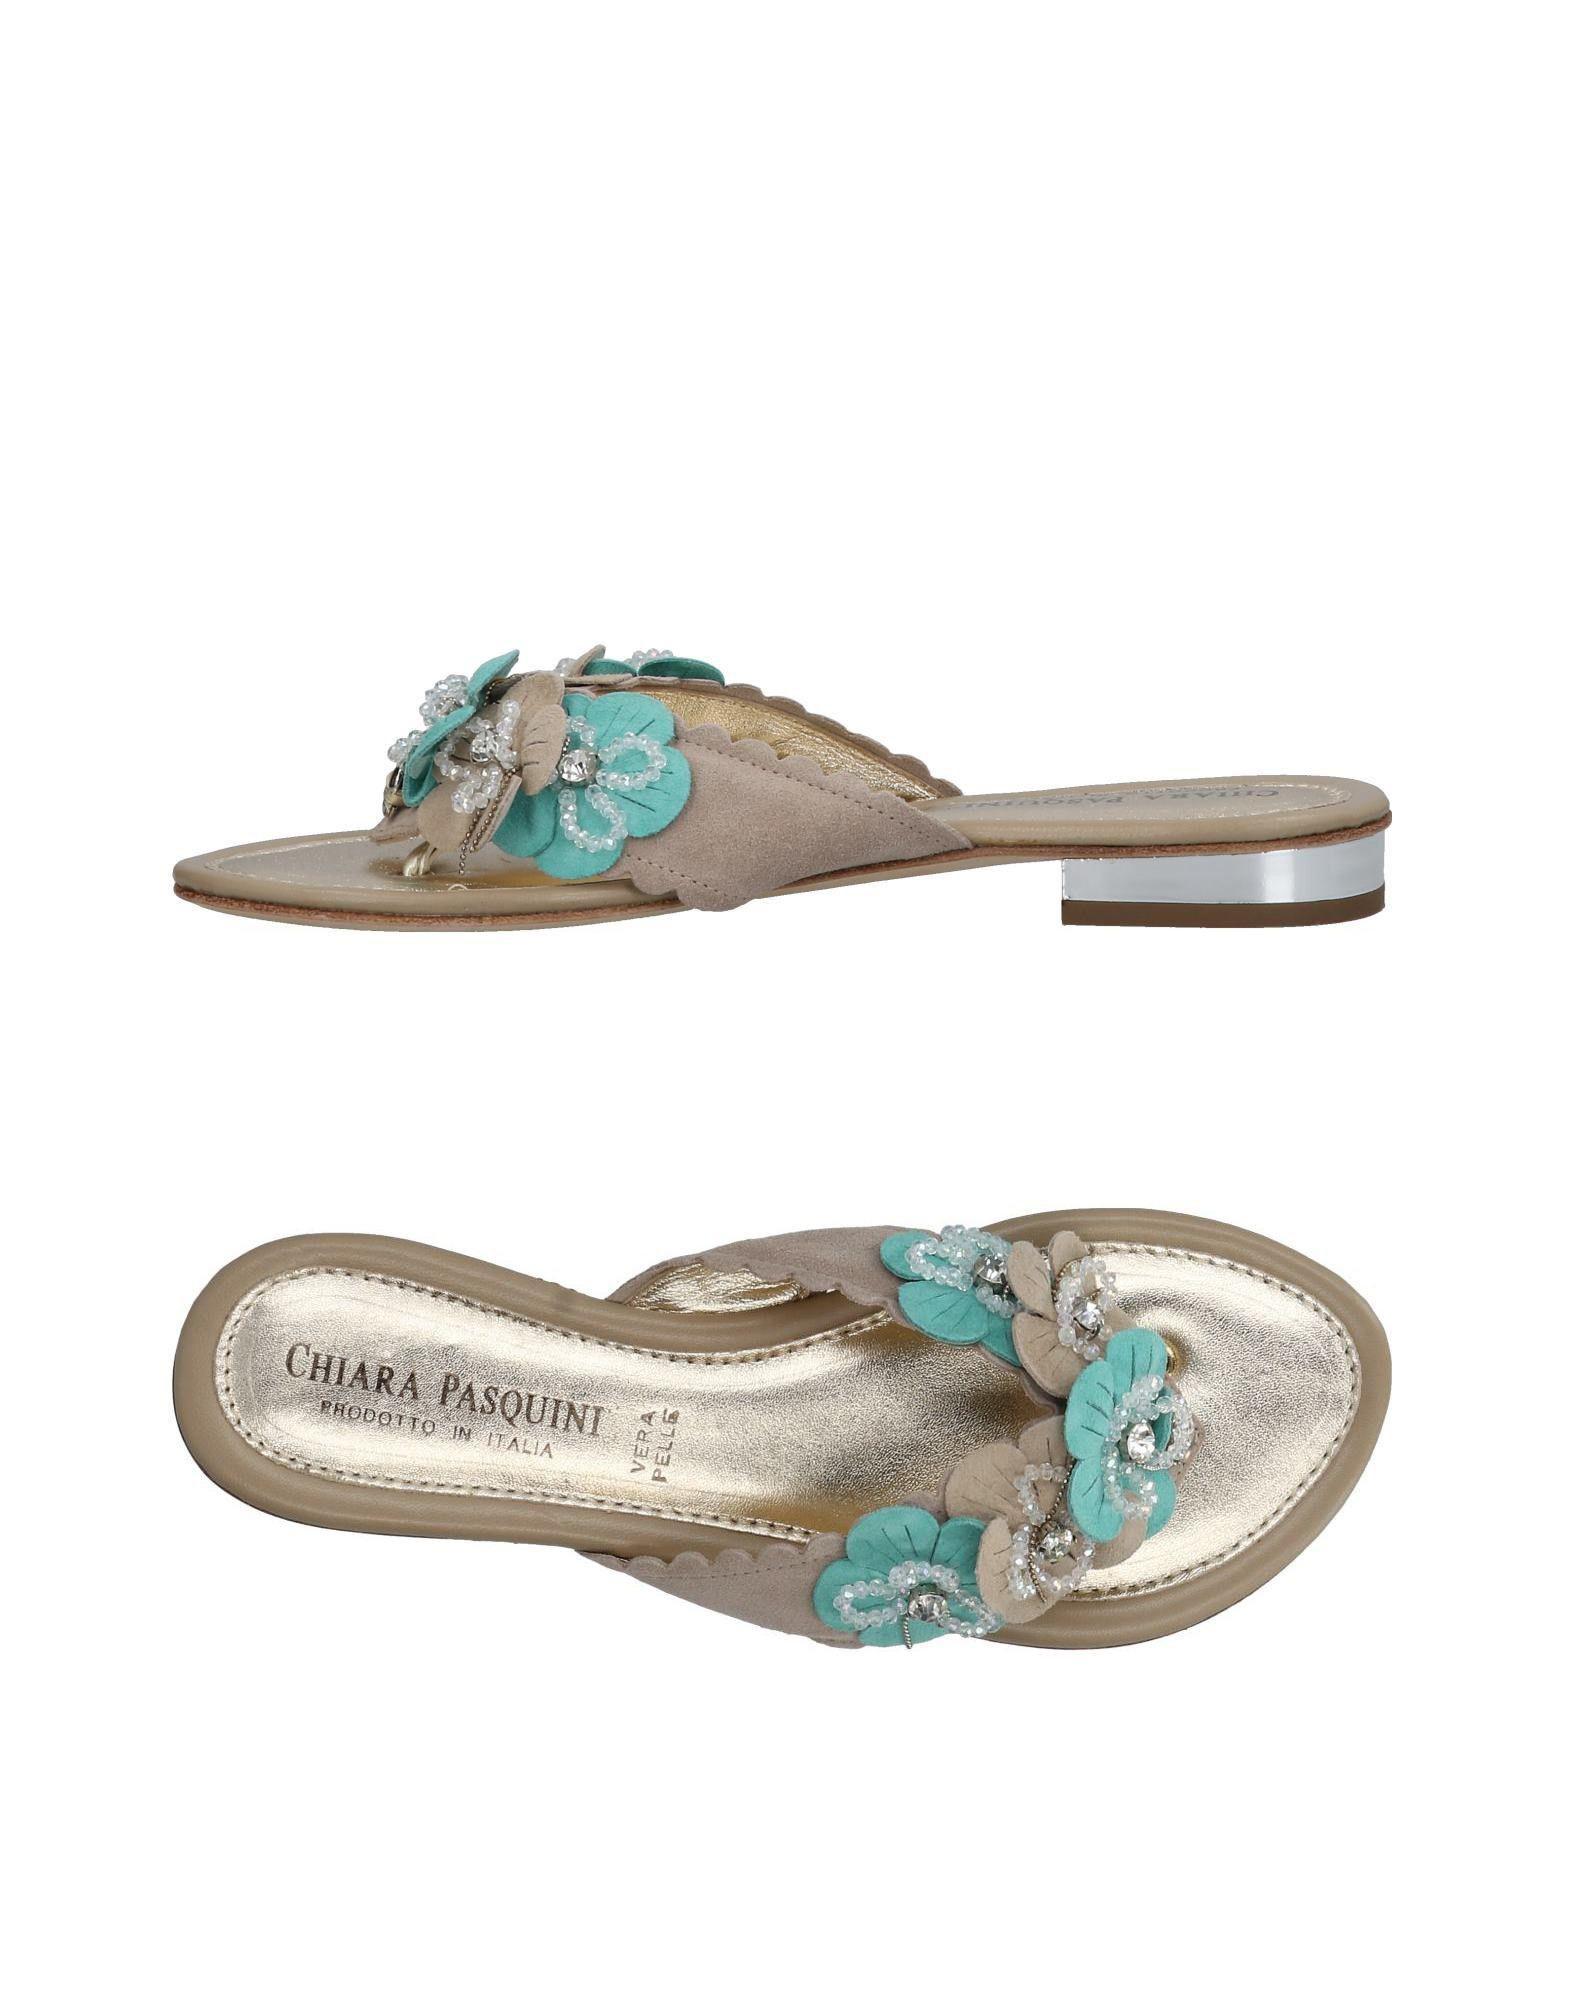 Sandale Entredoigt Pasquini Chiara n8Stx4